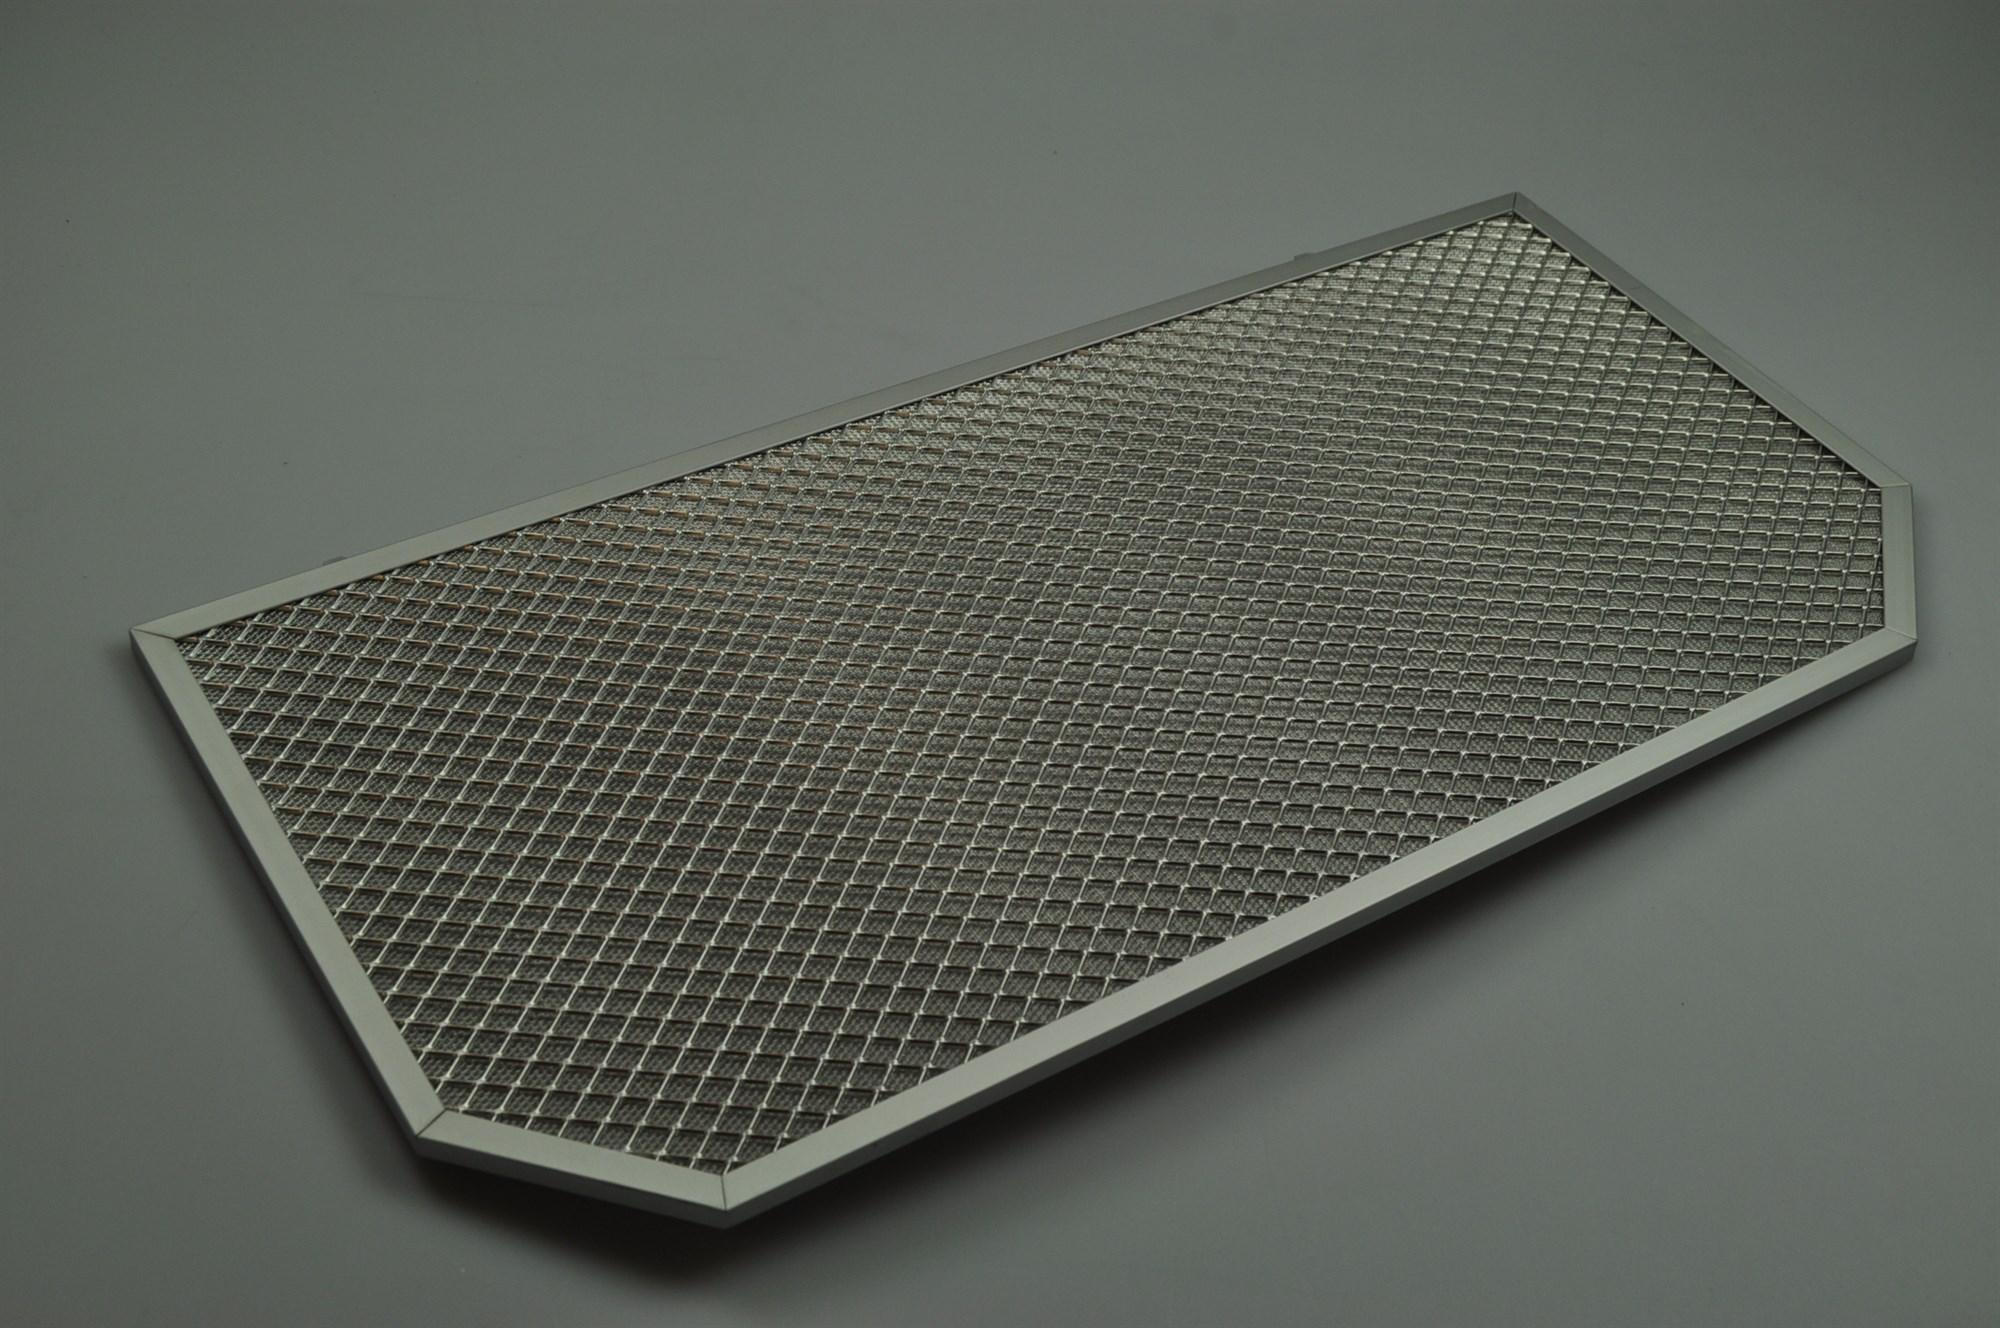 Metallfilter neff dunstabzugshaube mm mm mm hinten